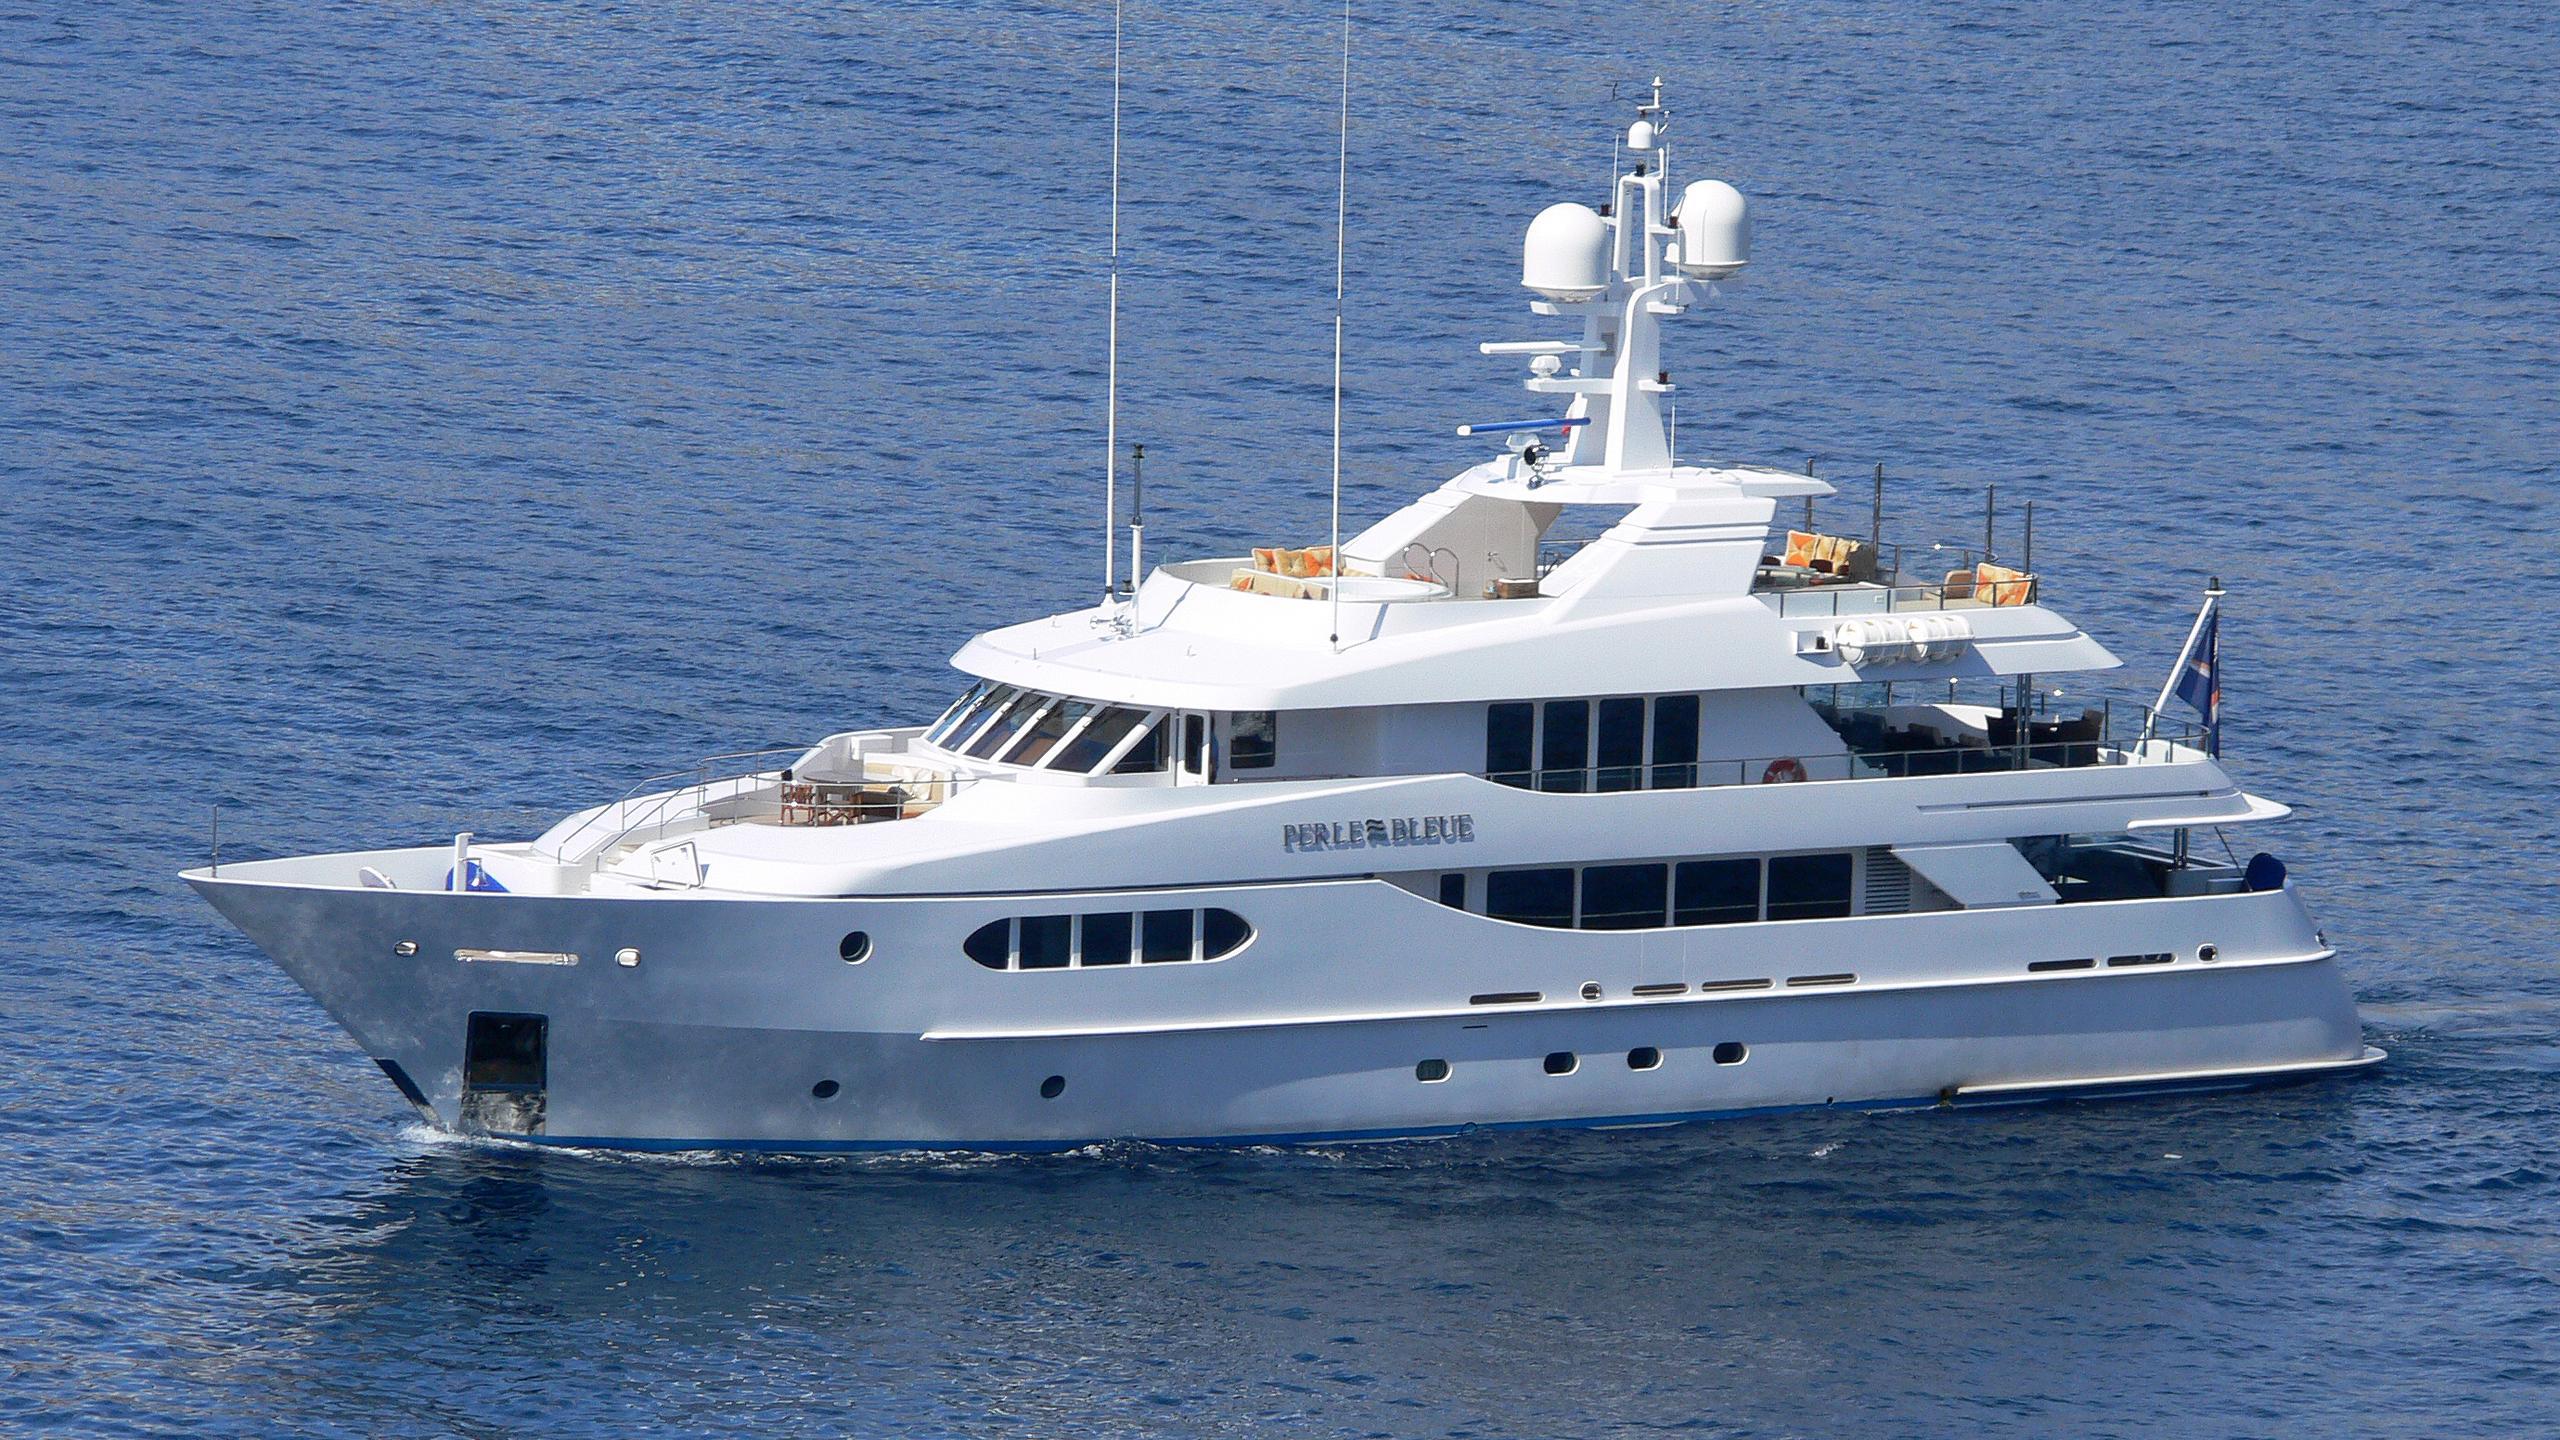 perle-bleue-yacht-exterior